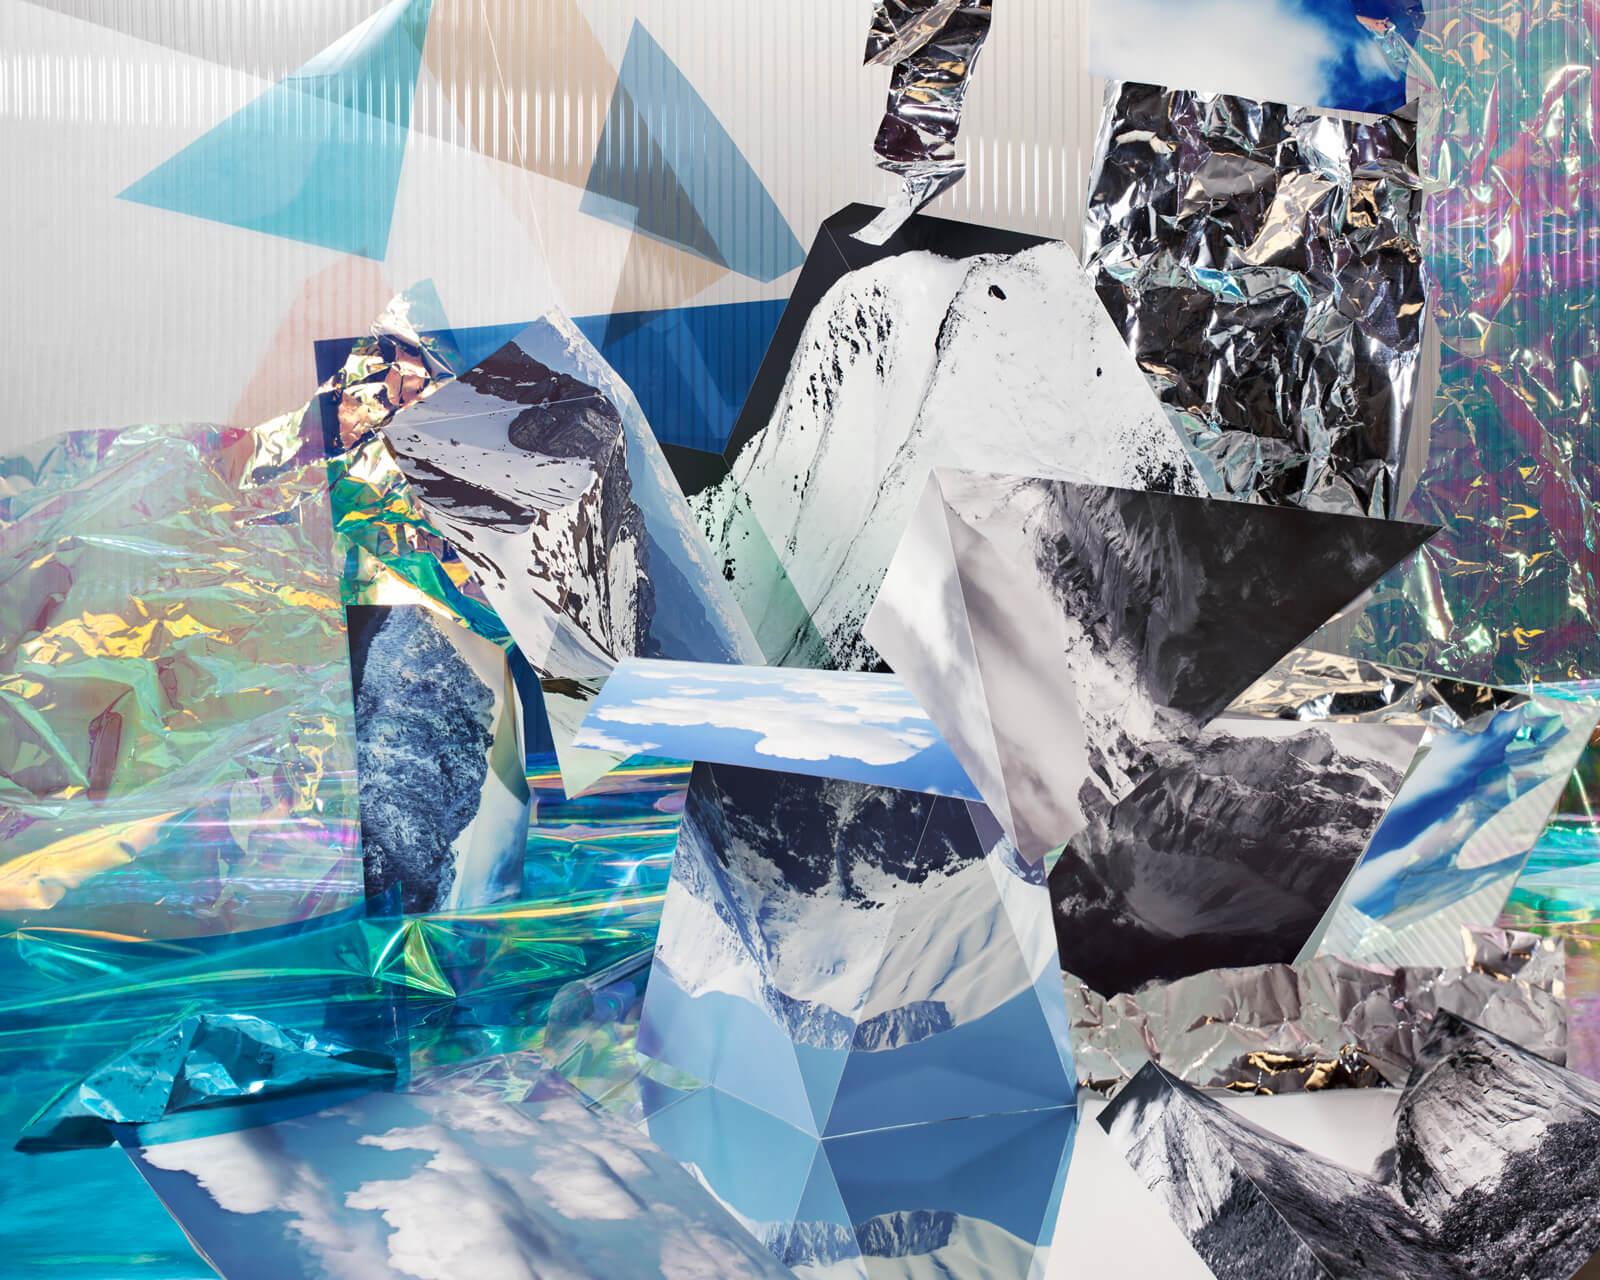 landscape_sublime-Anastasia_samoylova-yogurt_magazine_06